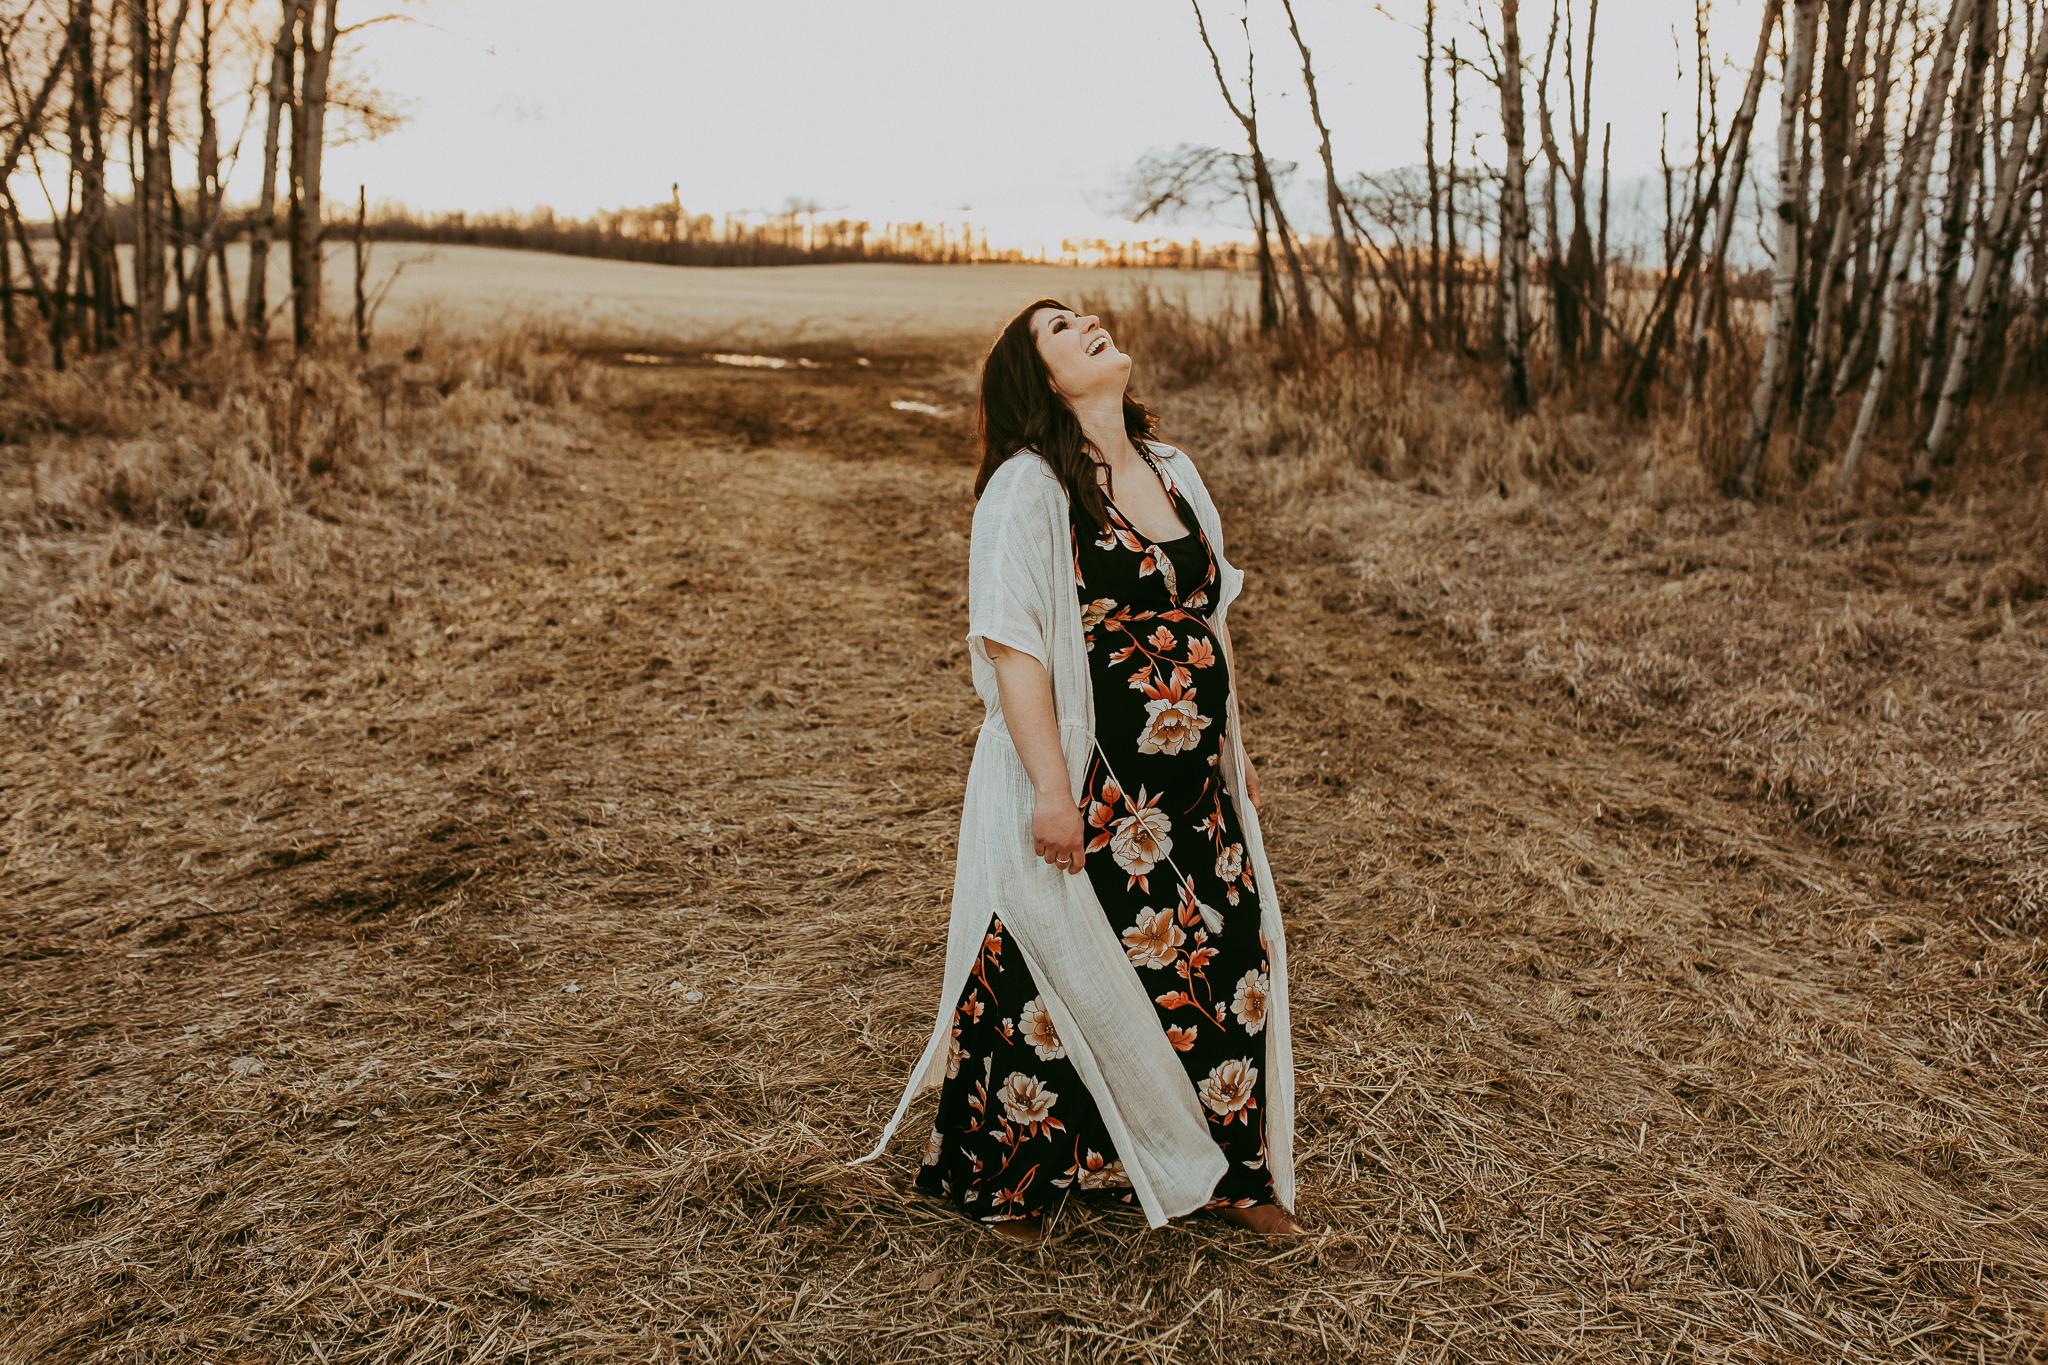 Alina-Joy-Photography-Cold-Lake-Maternity-Photographer-Josee-60.jpg